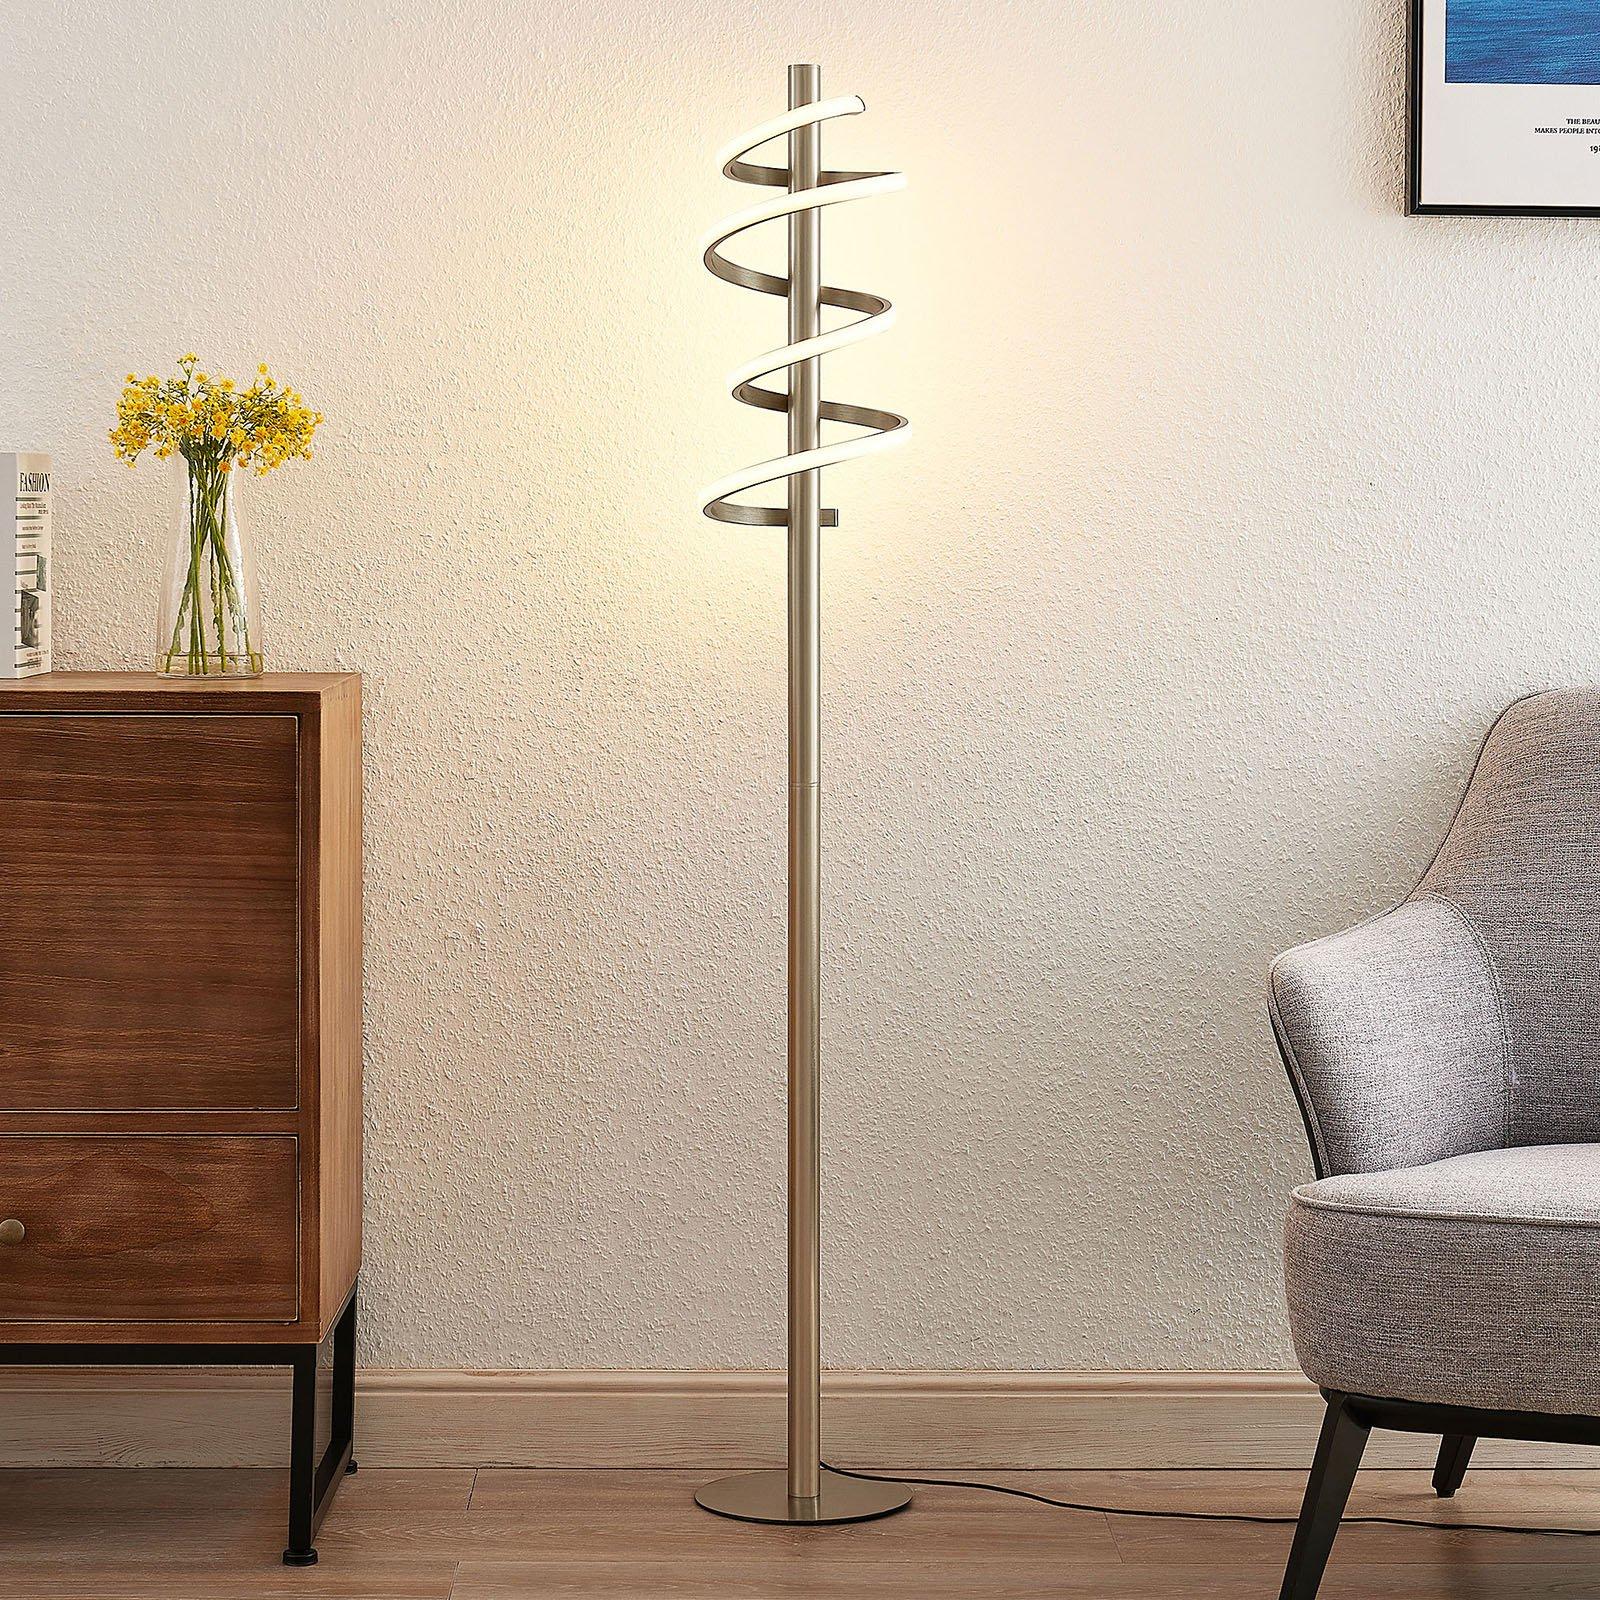 Lucande Milora LED-gulvlampe, satinert nikkel